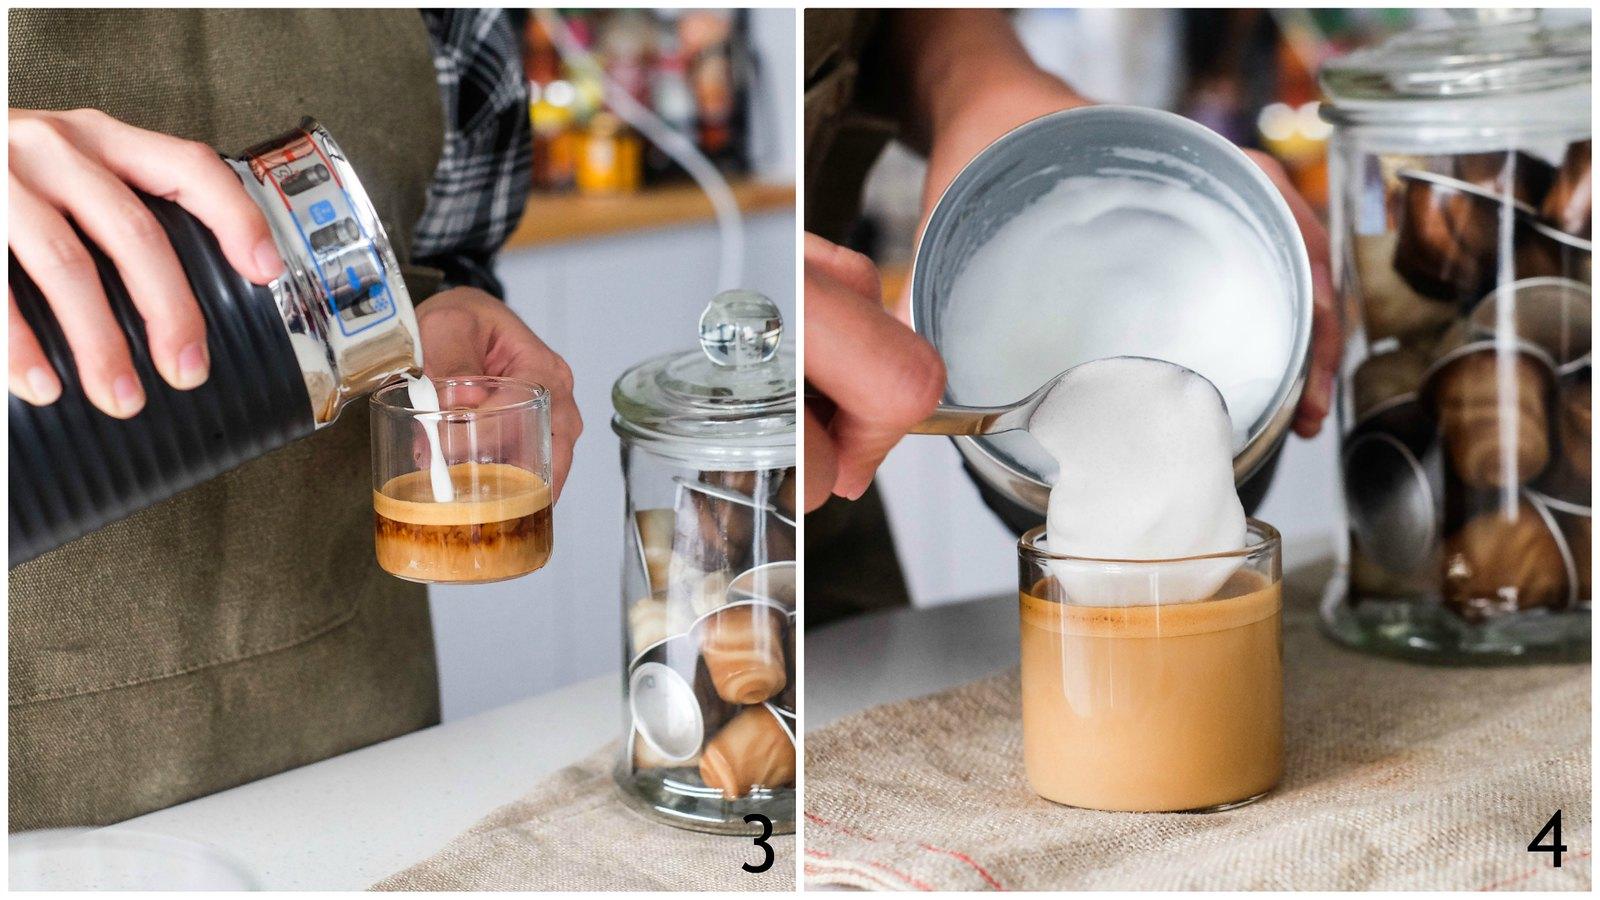 How to use a Nespresso machine 2